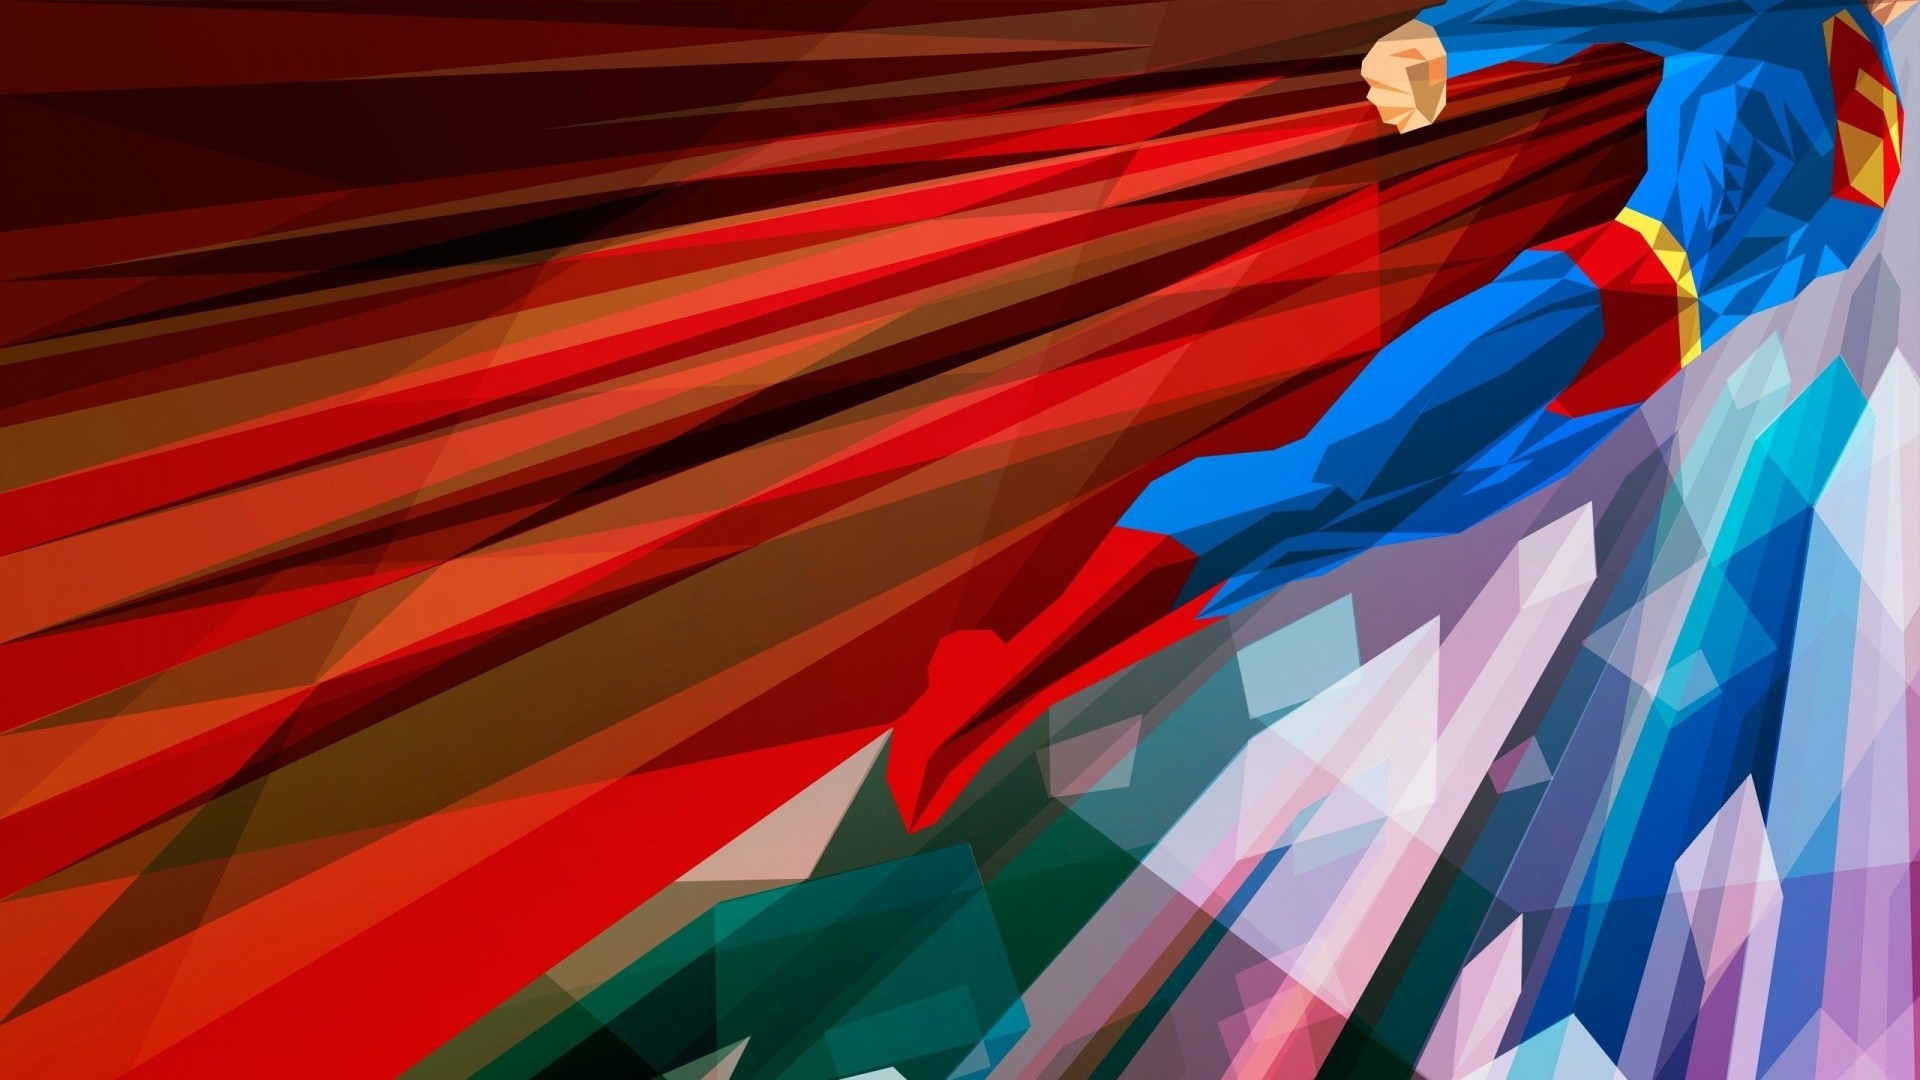 … Background Full HD 1080p. Wallpaper superhero, superman,  bright